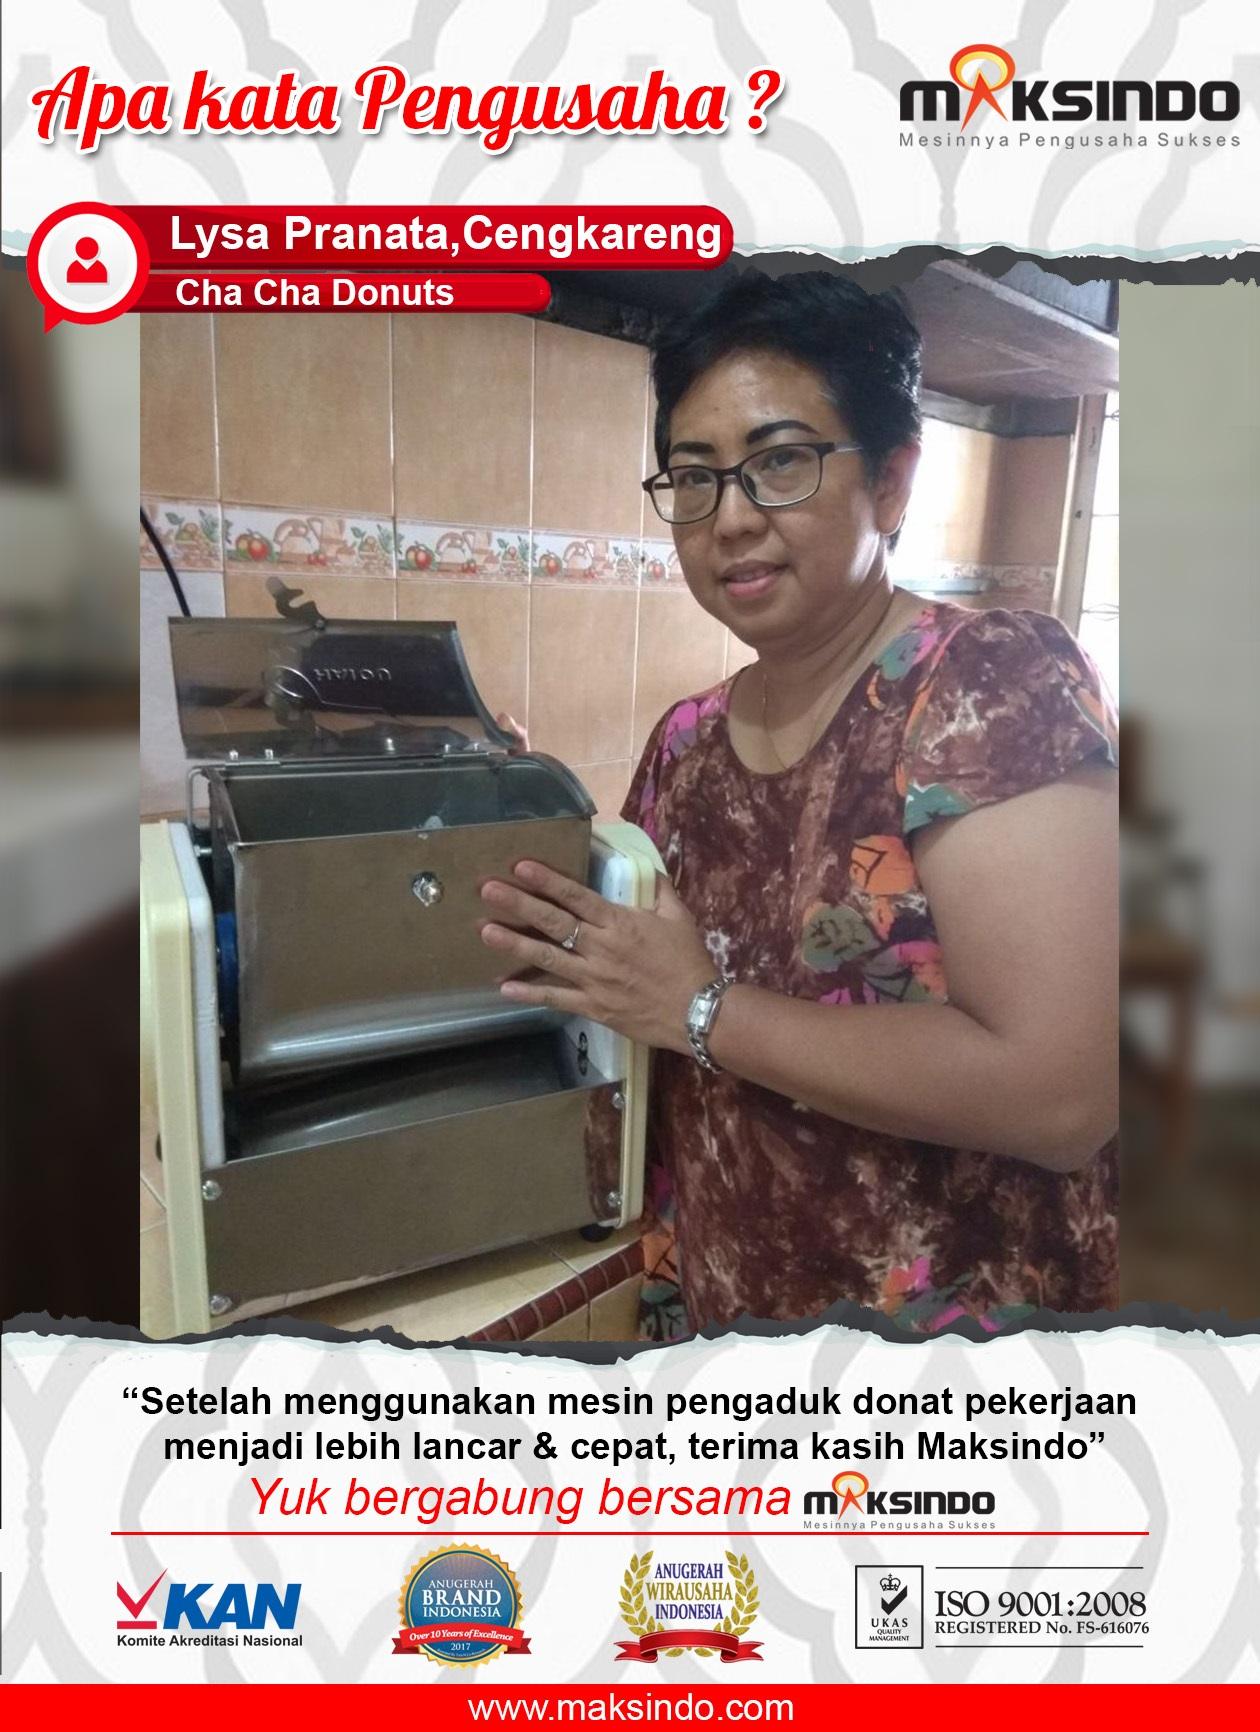 Cha Cha Donuts : Pekerjaan Semakin Lancar Dan Cepat Dengan Mesin Pengaduk Dari Maksindo